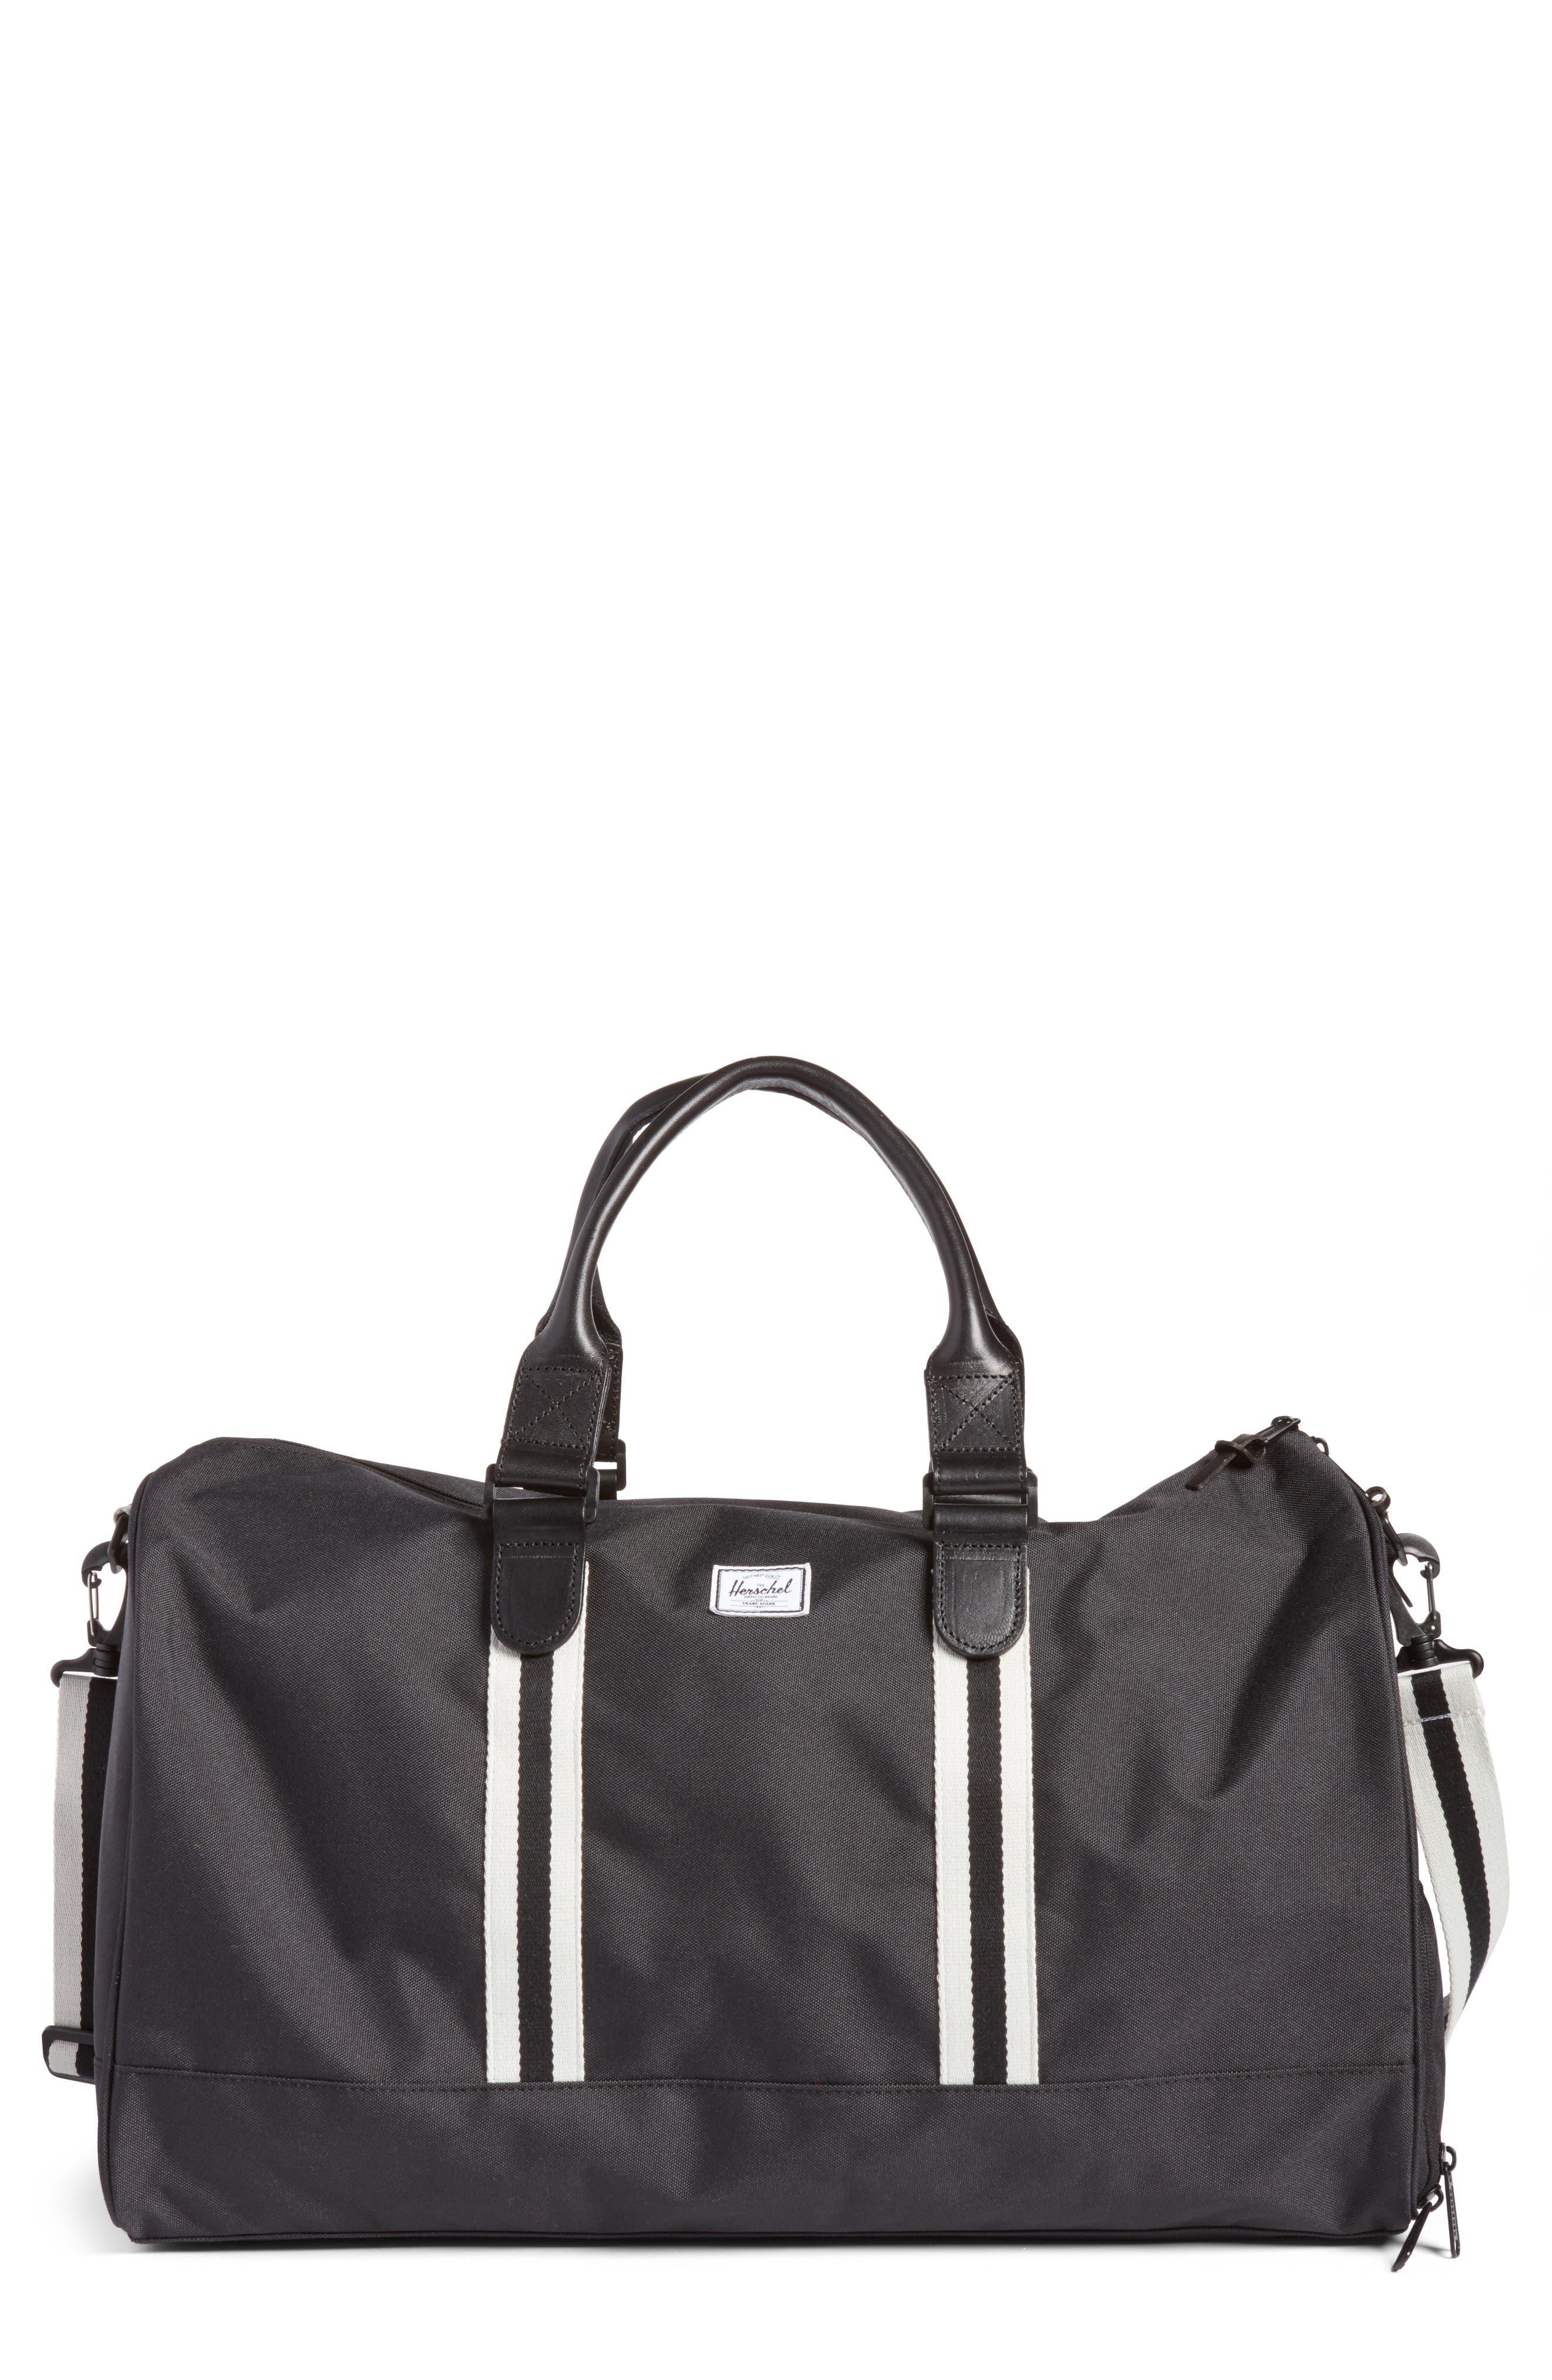 Novel Duffel Bag,                         Main,                         color, 002